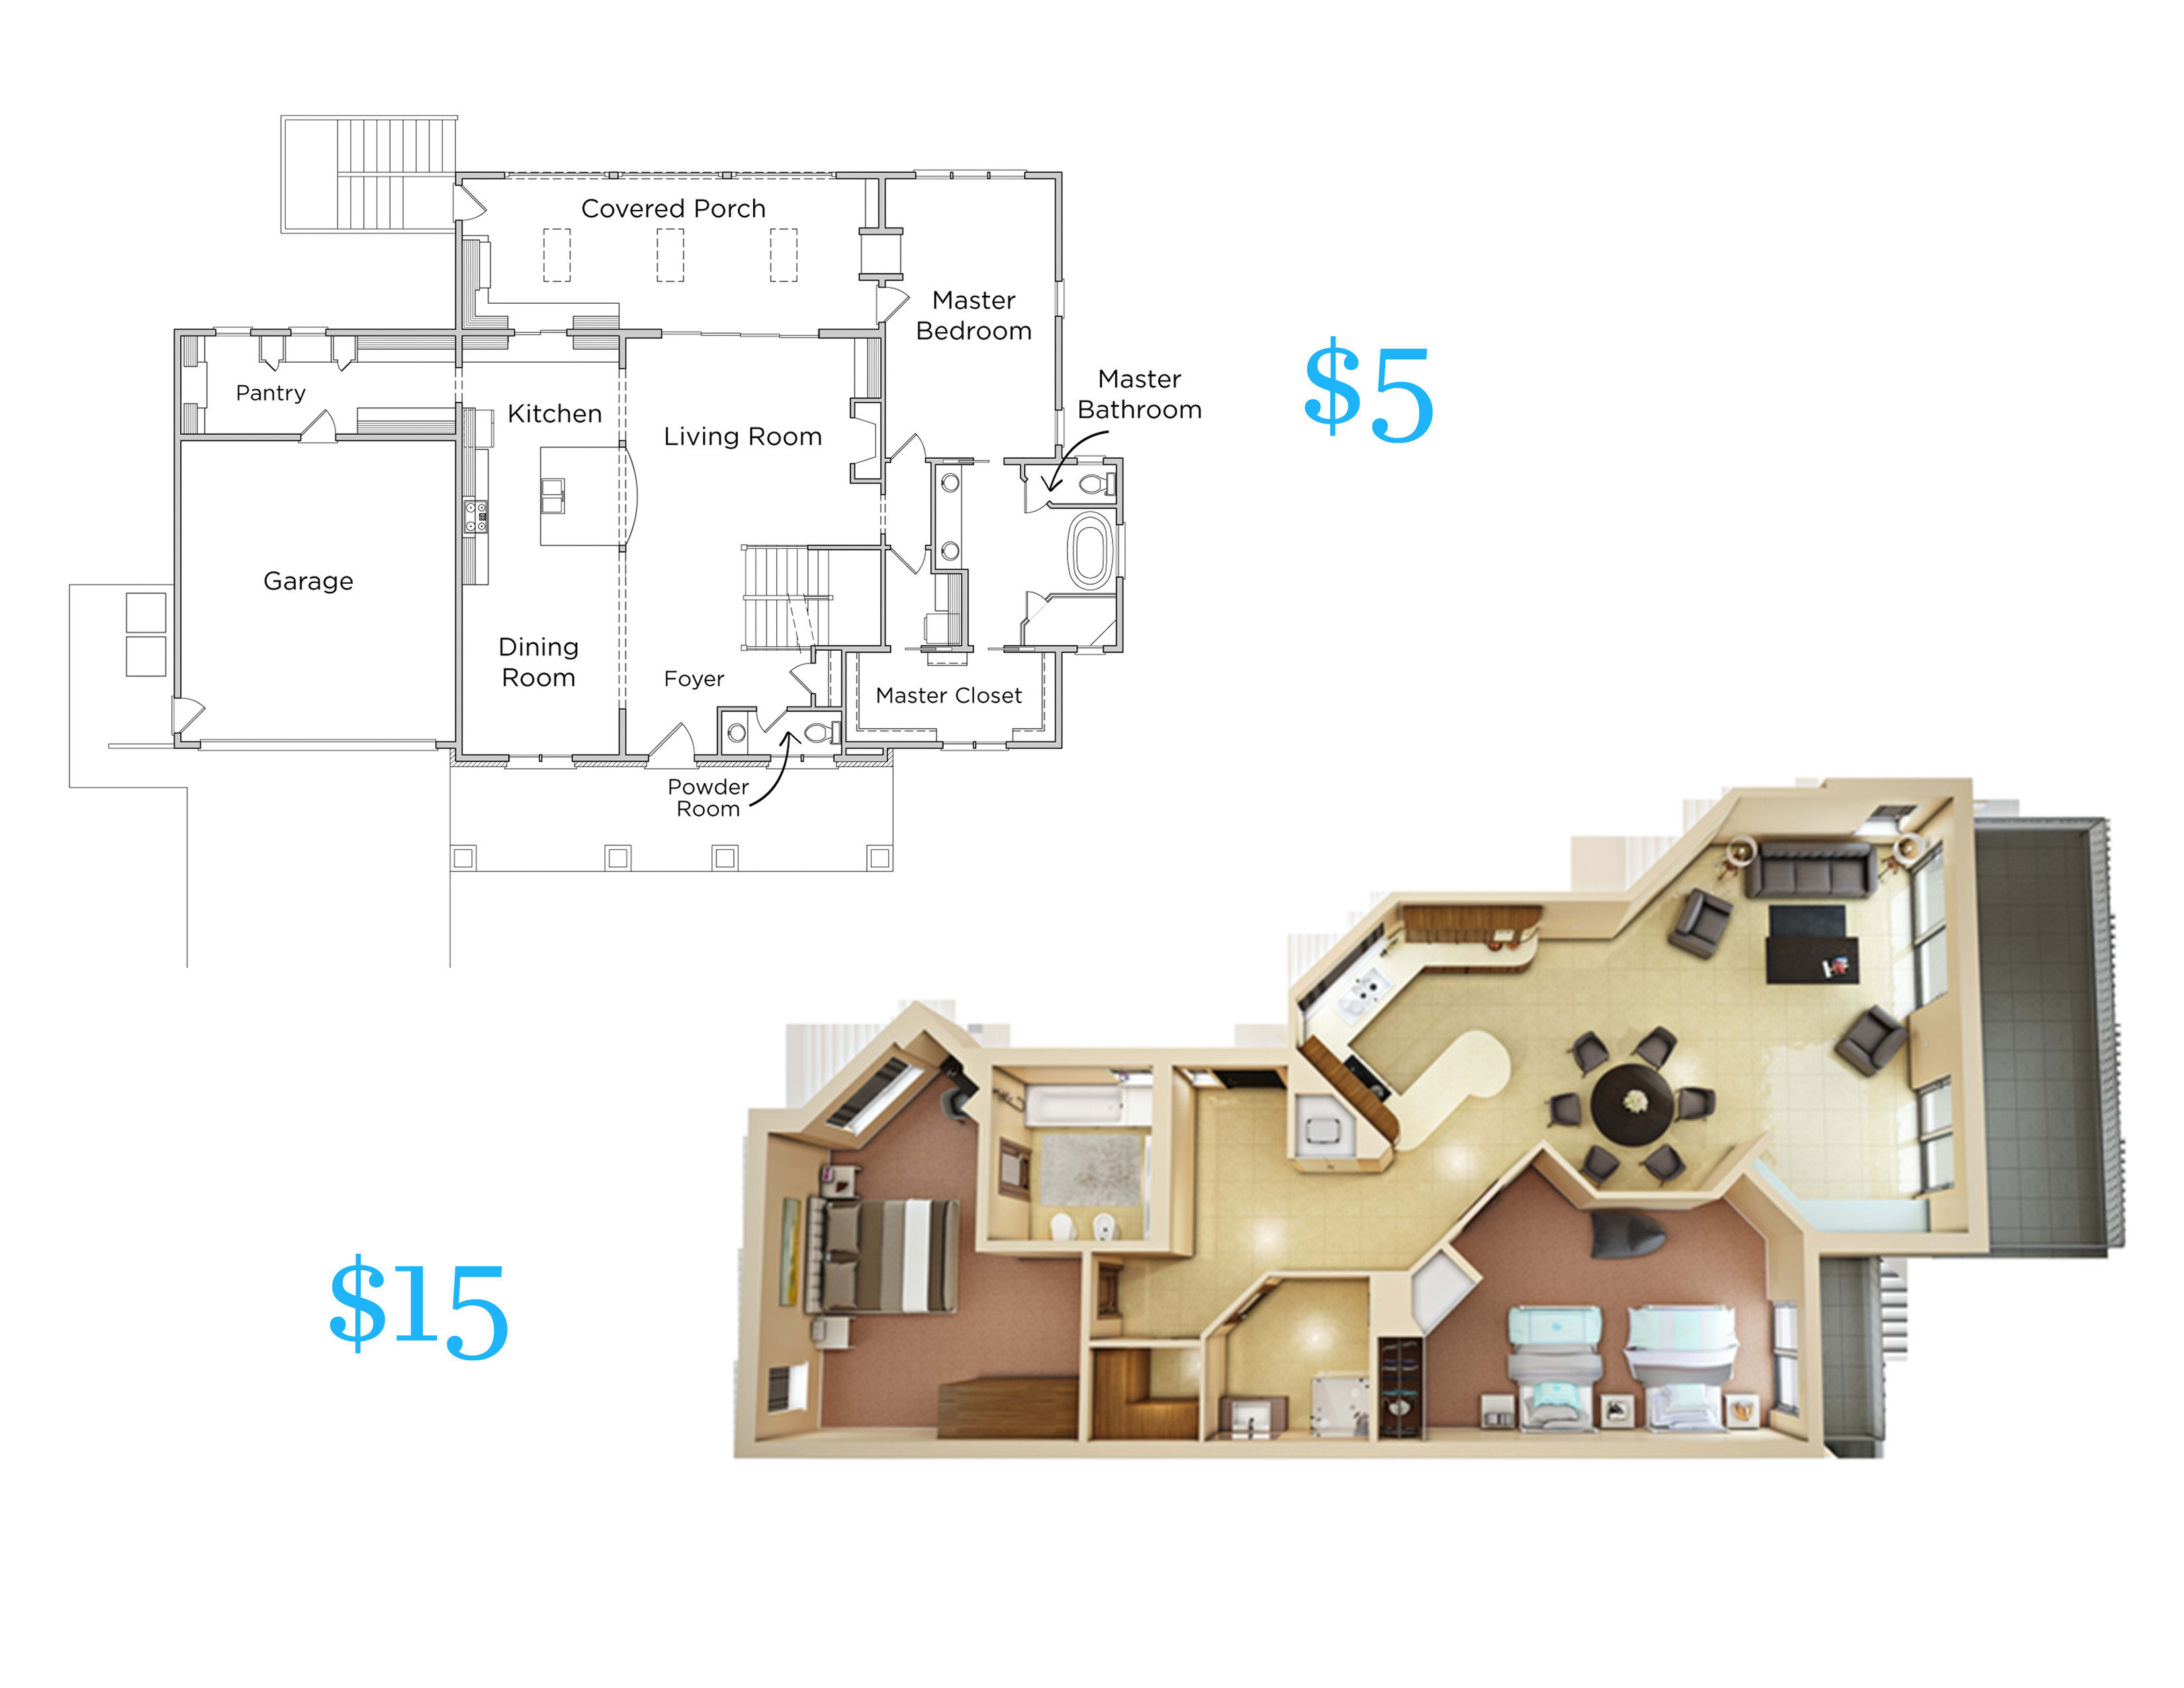 Make 3d Floor Plan From Hand Sketch 2d Floor Plan By Designpurpose